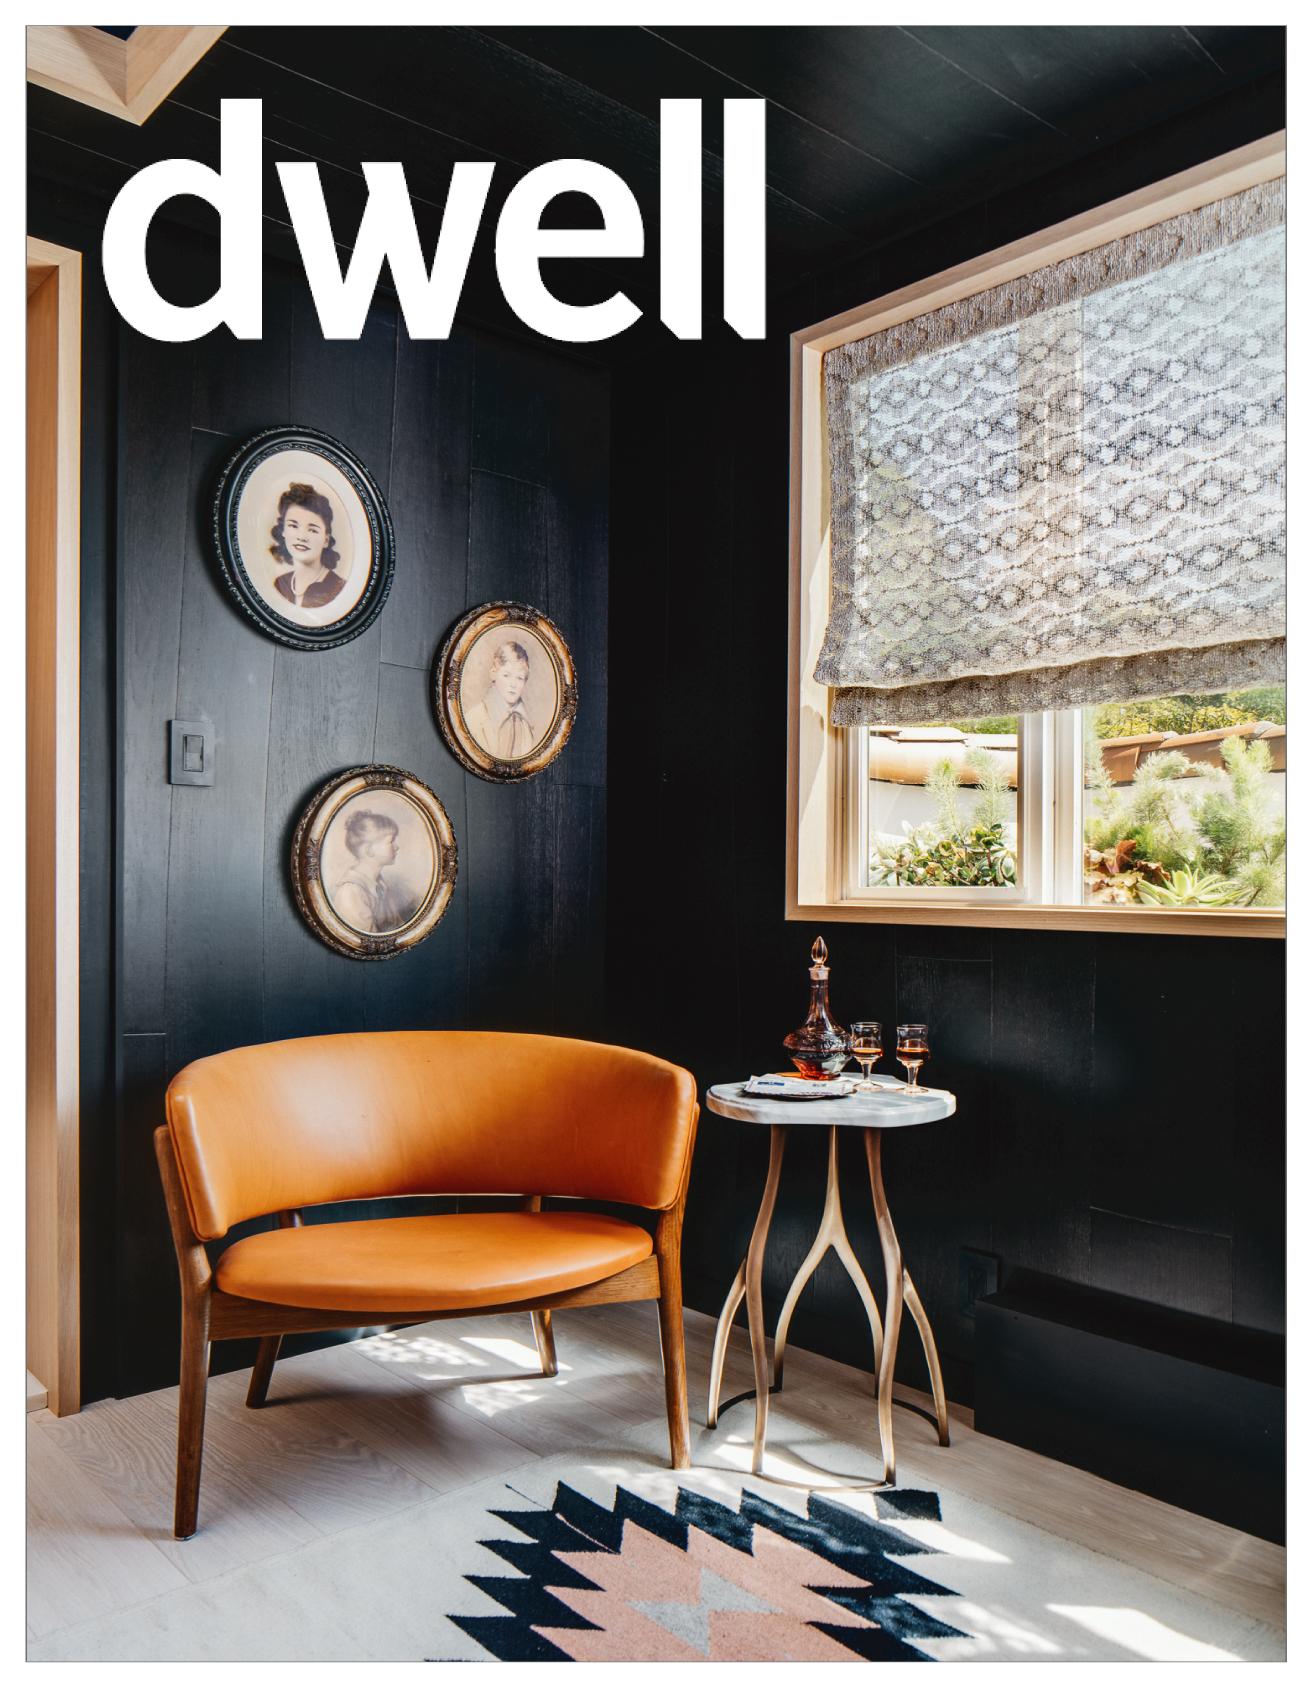 Dwell_8.5x11_NEW-01.jpg